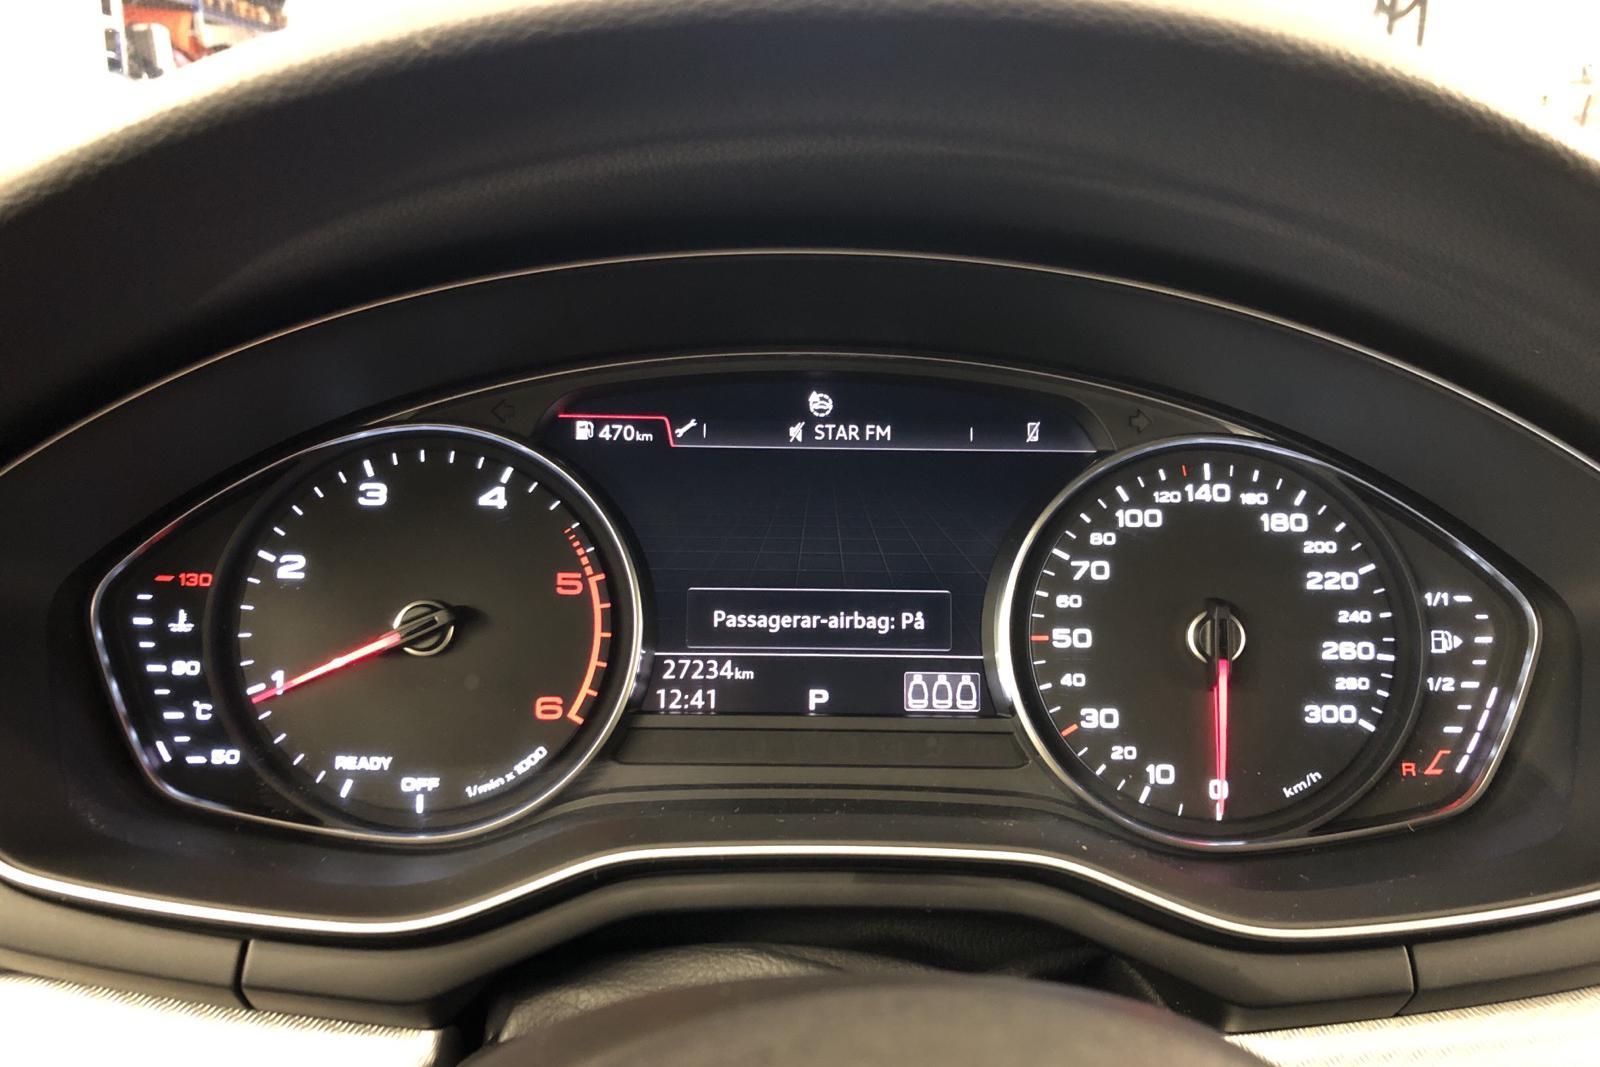 Audi A4 2.0 TDI Avant (150hk) - 27 230 km - Automatic - white - 2017